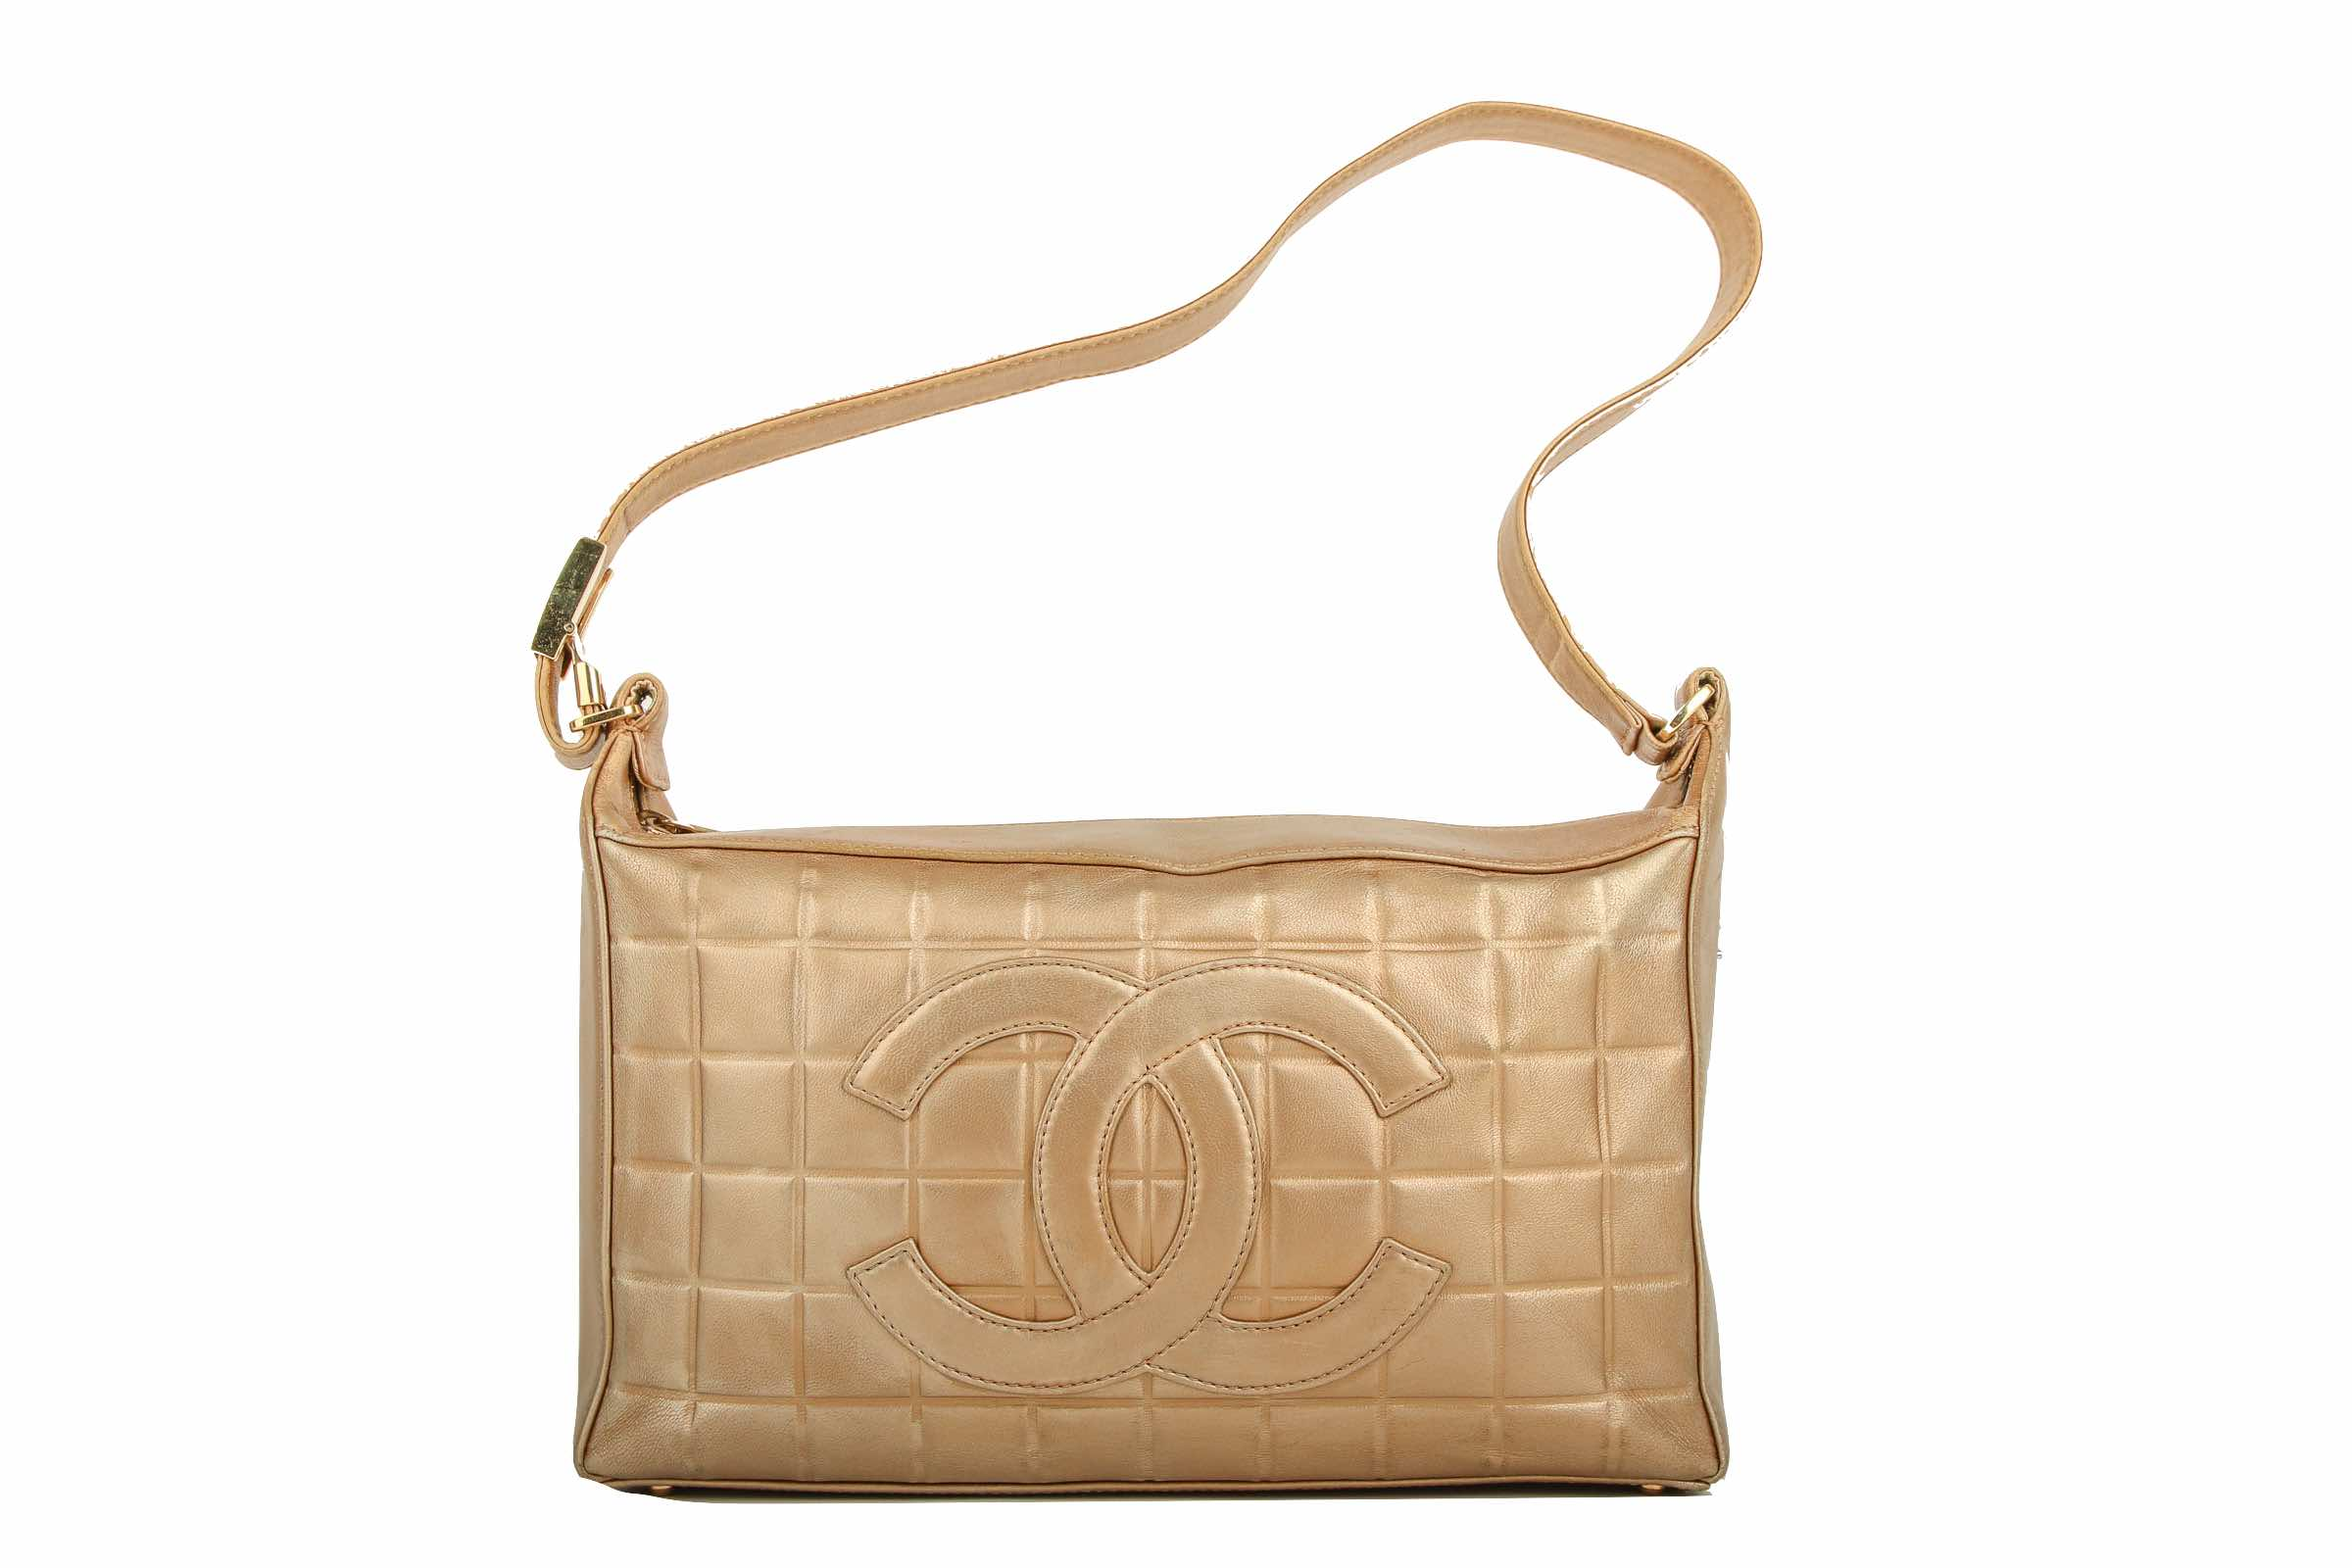 5800efa9252e8 Luxus Handtaschen Onlineshop